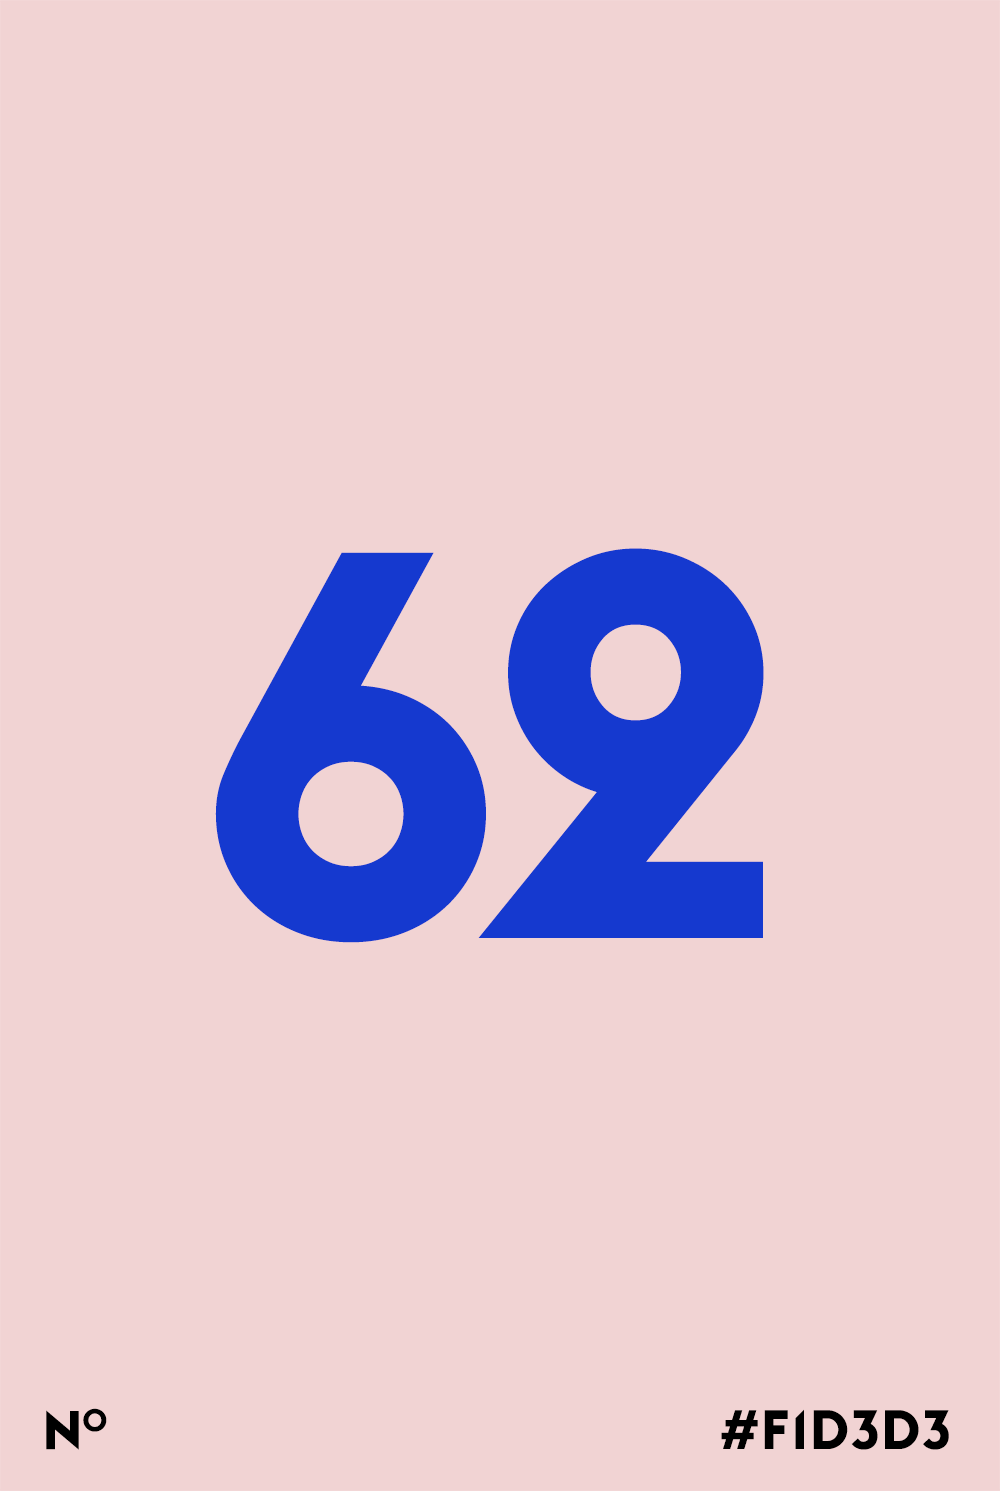 cc_0061_62